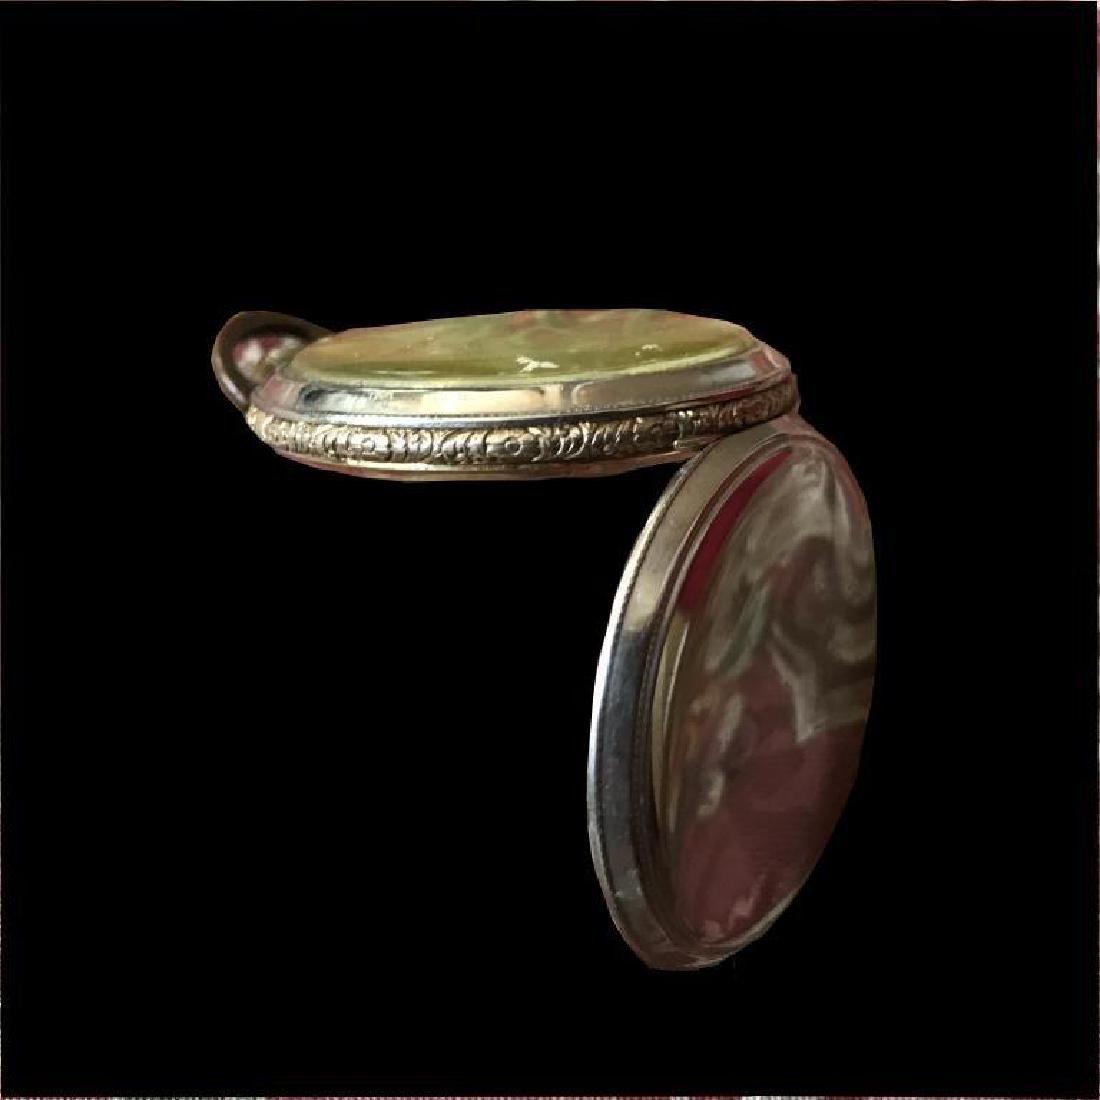 1905 Longines 17 Jewels Gold Filled Pocket Watch - 7